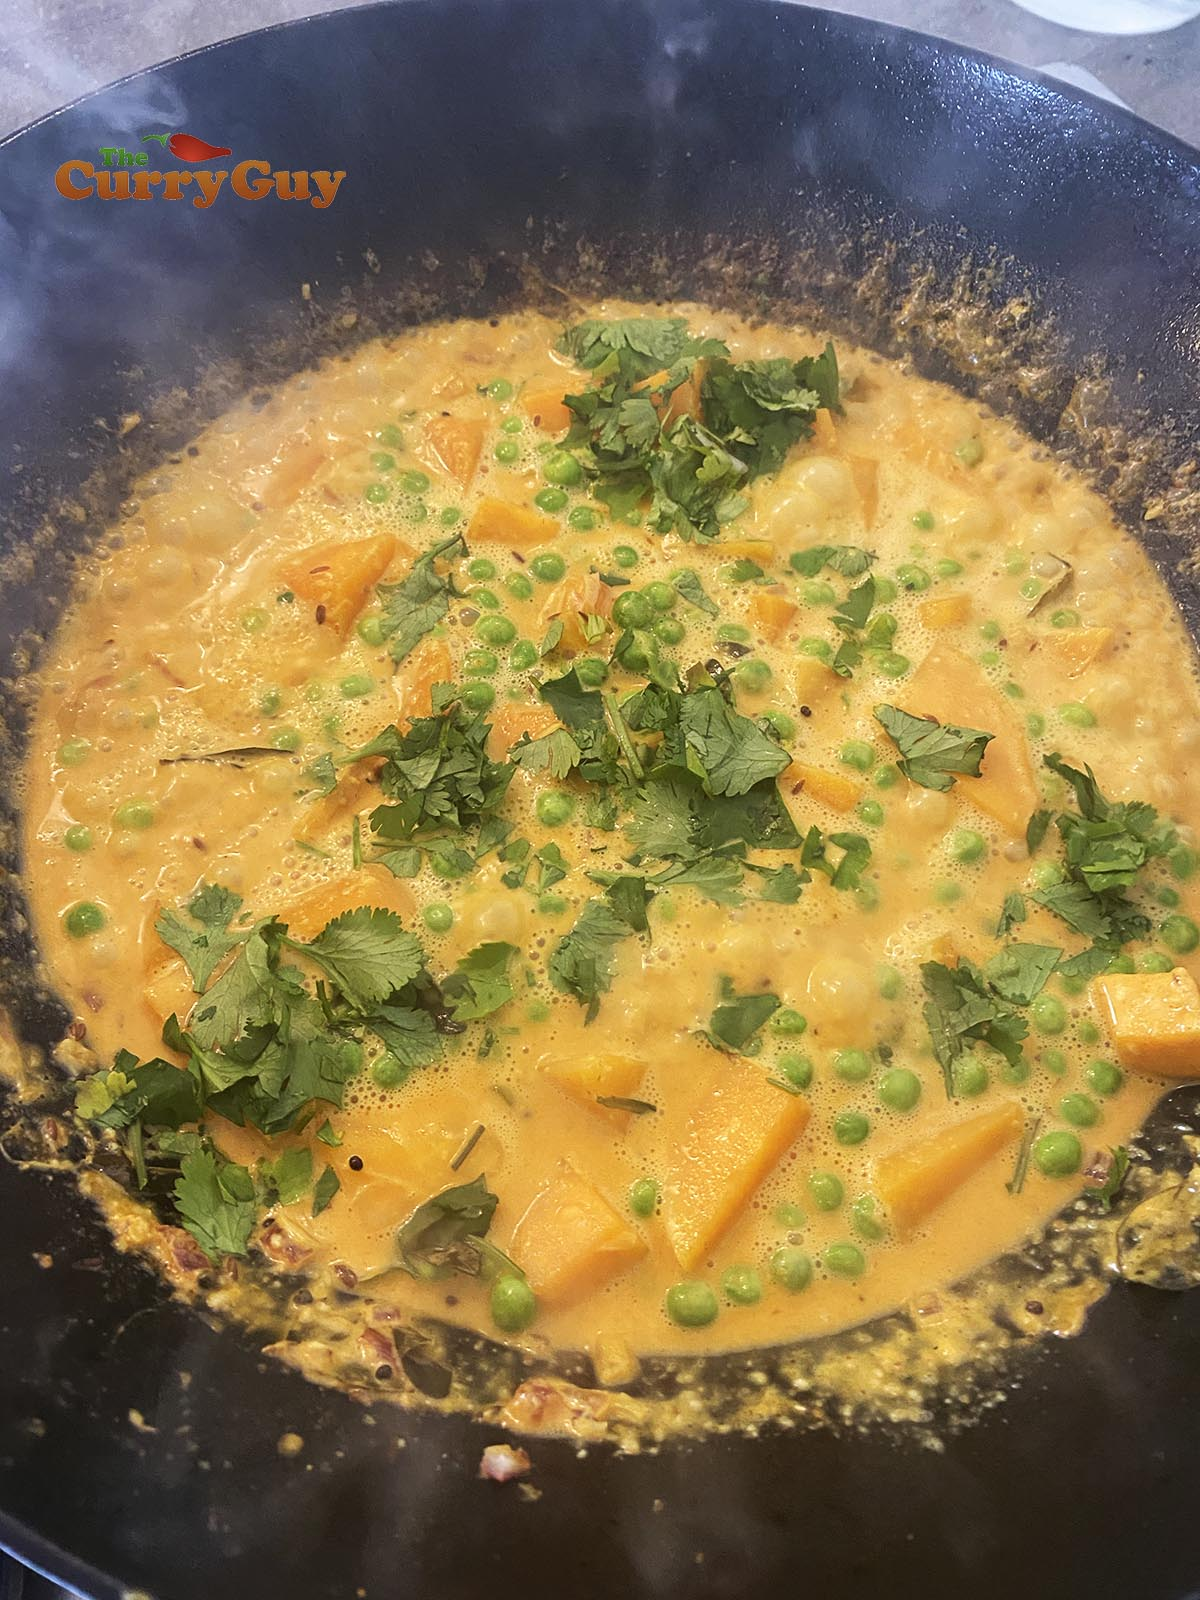 Butternut squash curry garnished with coriander (cilantro)